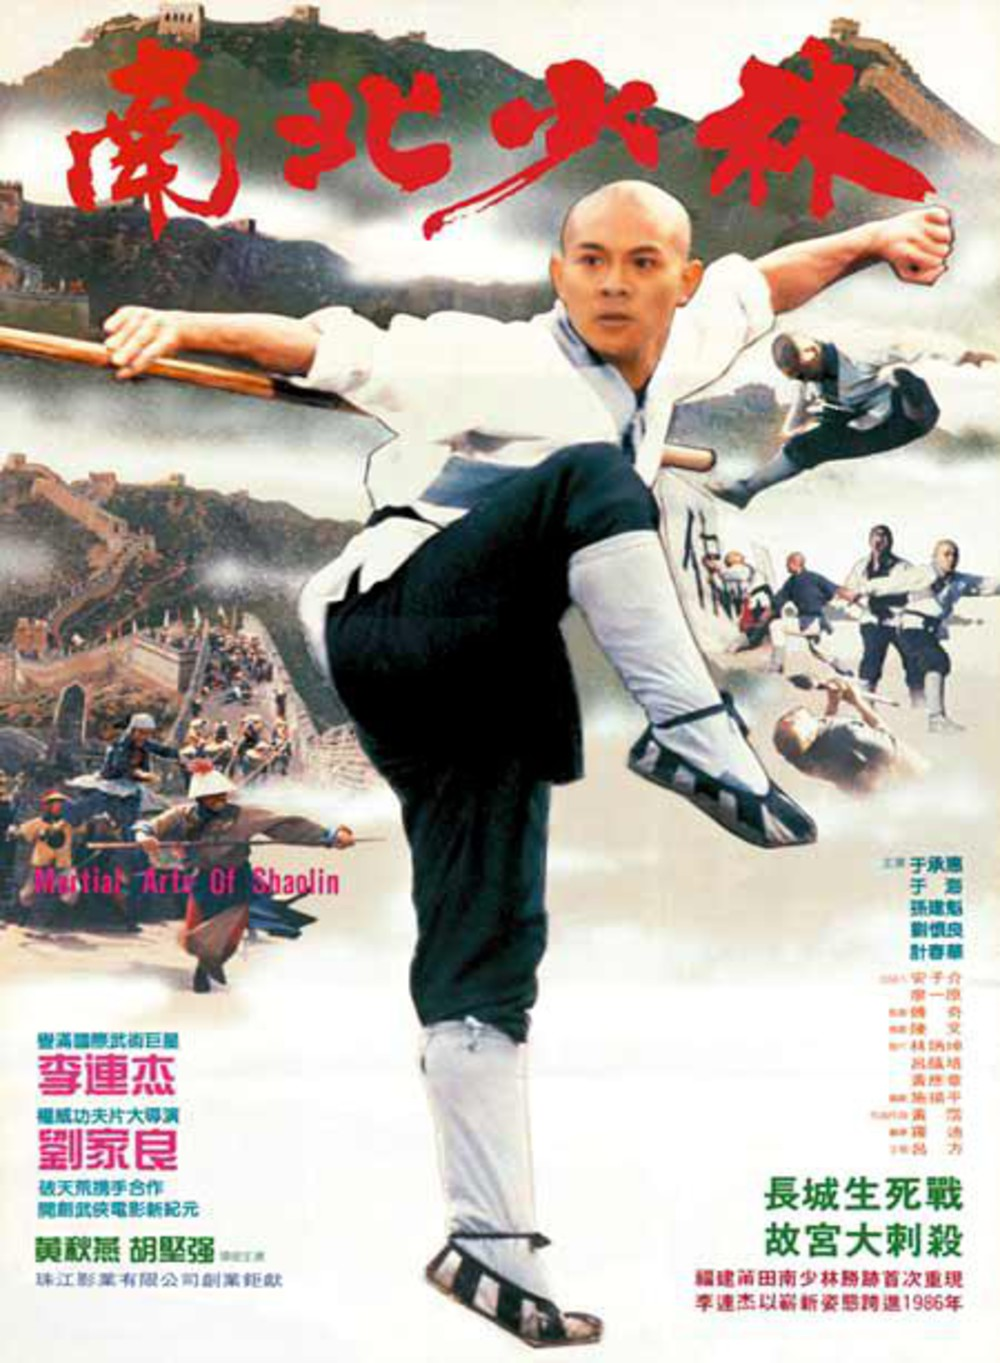 The Shaolin Temple : Martial Art of Shaolin (1986) เสี้ยวลิ้มยี่ ภาค 3 มังกรน่ำปั๊ก